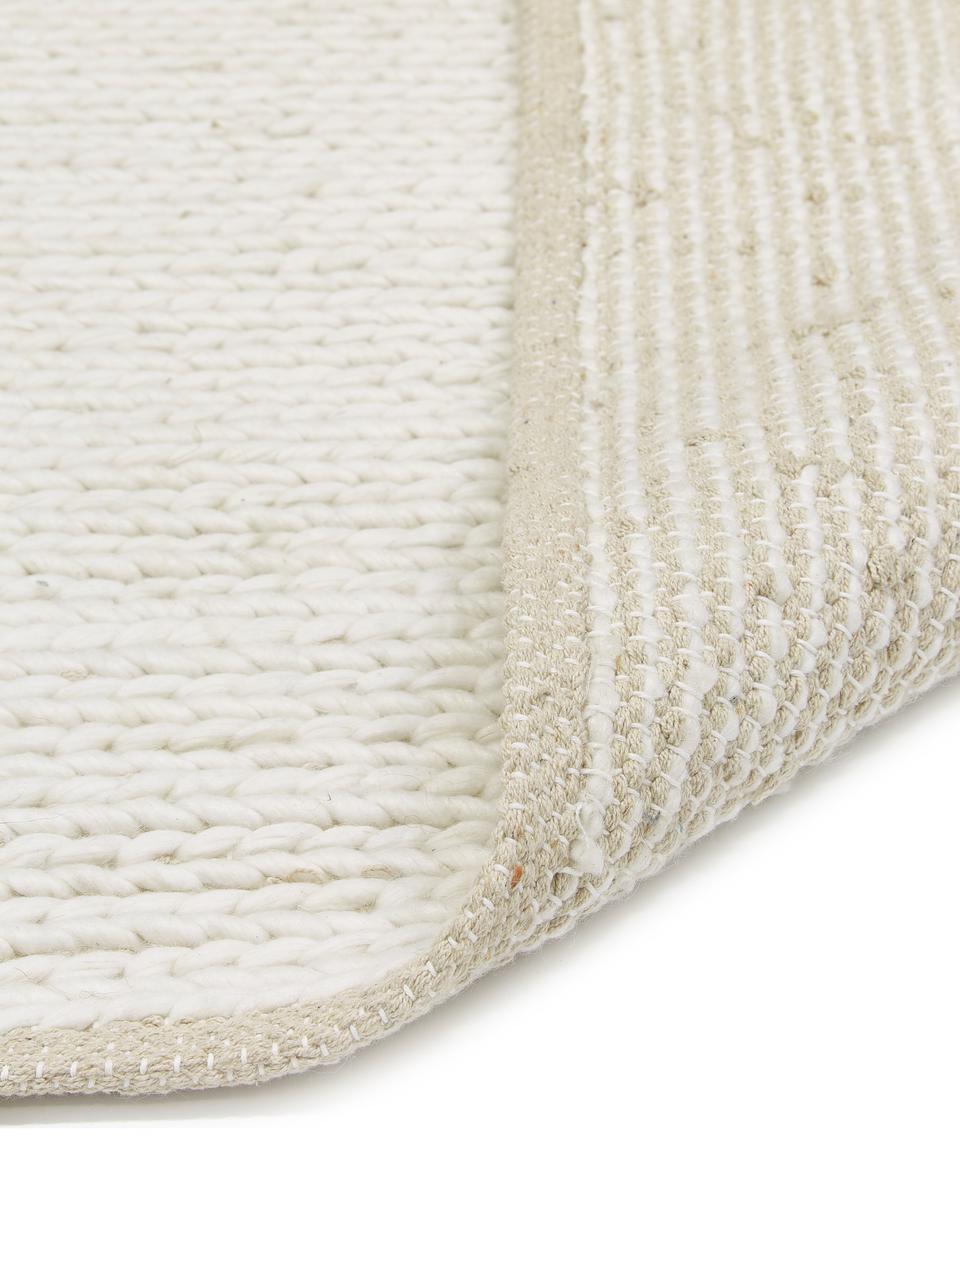 tapis en laine tisse main uno